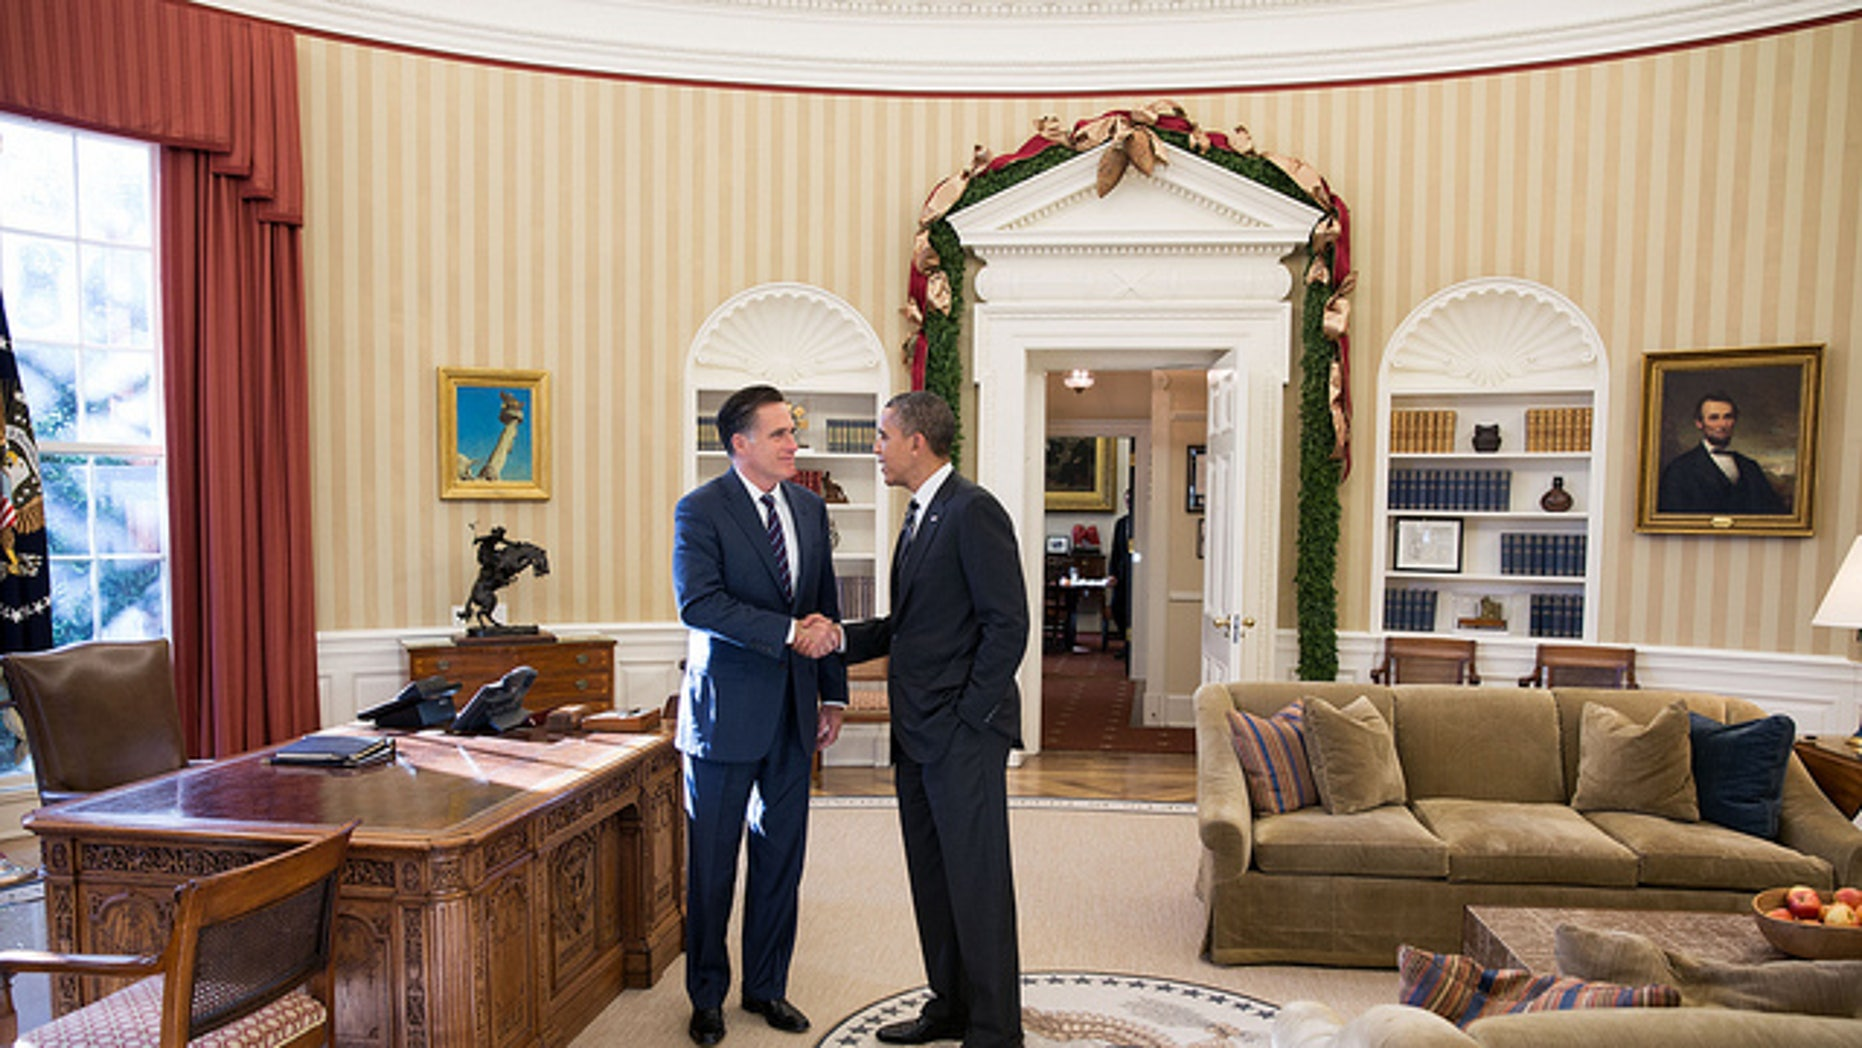 Nov. 29, 2012: President Obama and former Massachusetts Gov. Mitt Romney talk in the Oval Office following their lunch.